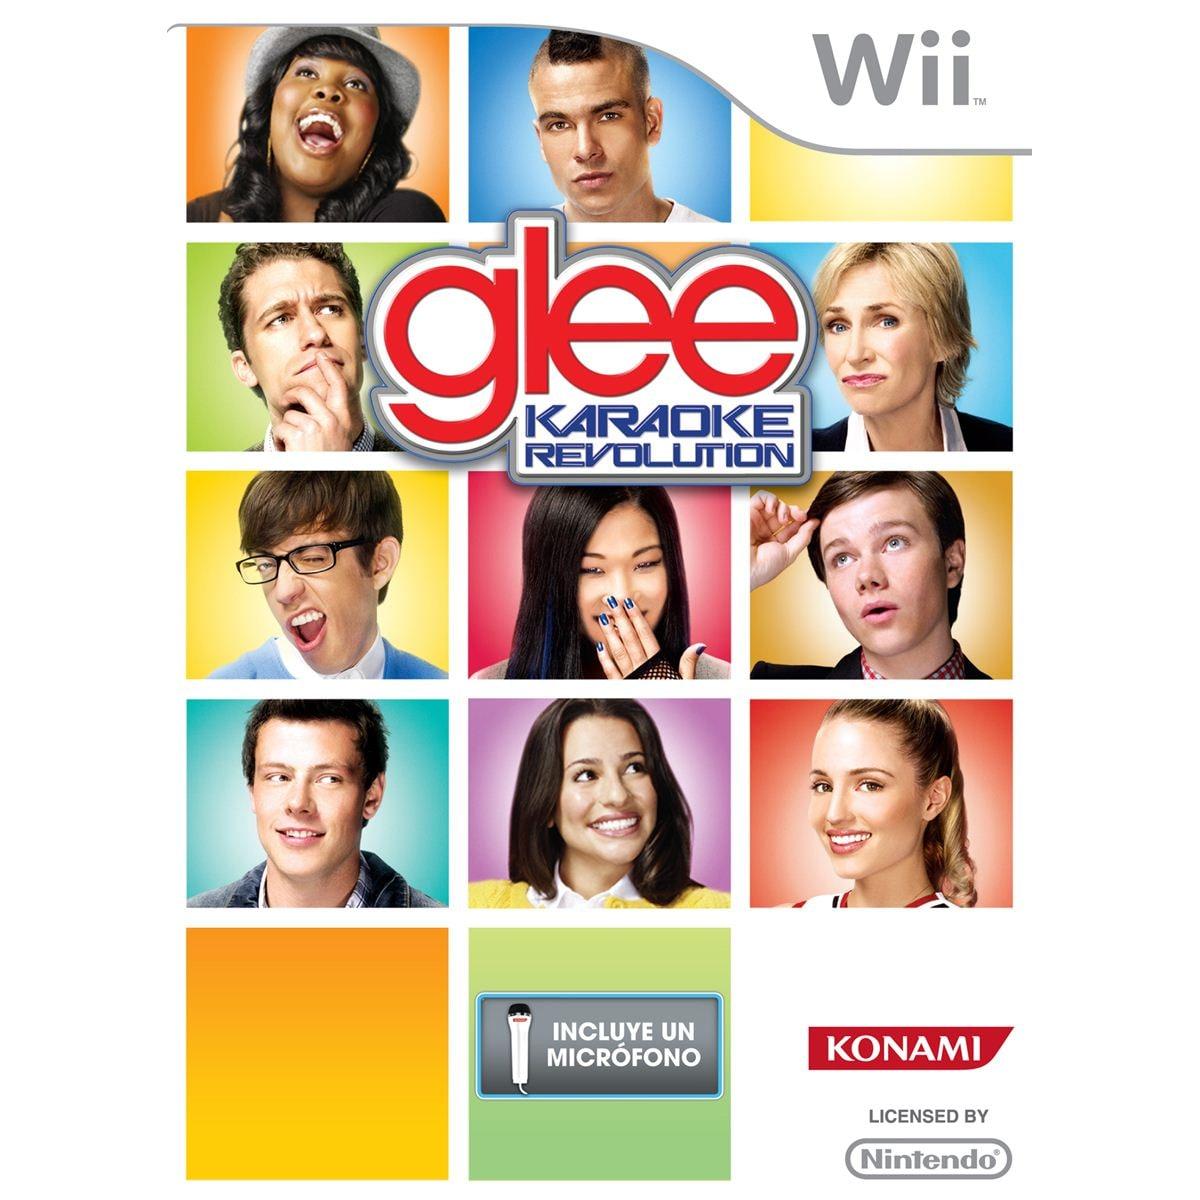 Wii Karaoke Revolution Glee Softwar